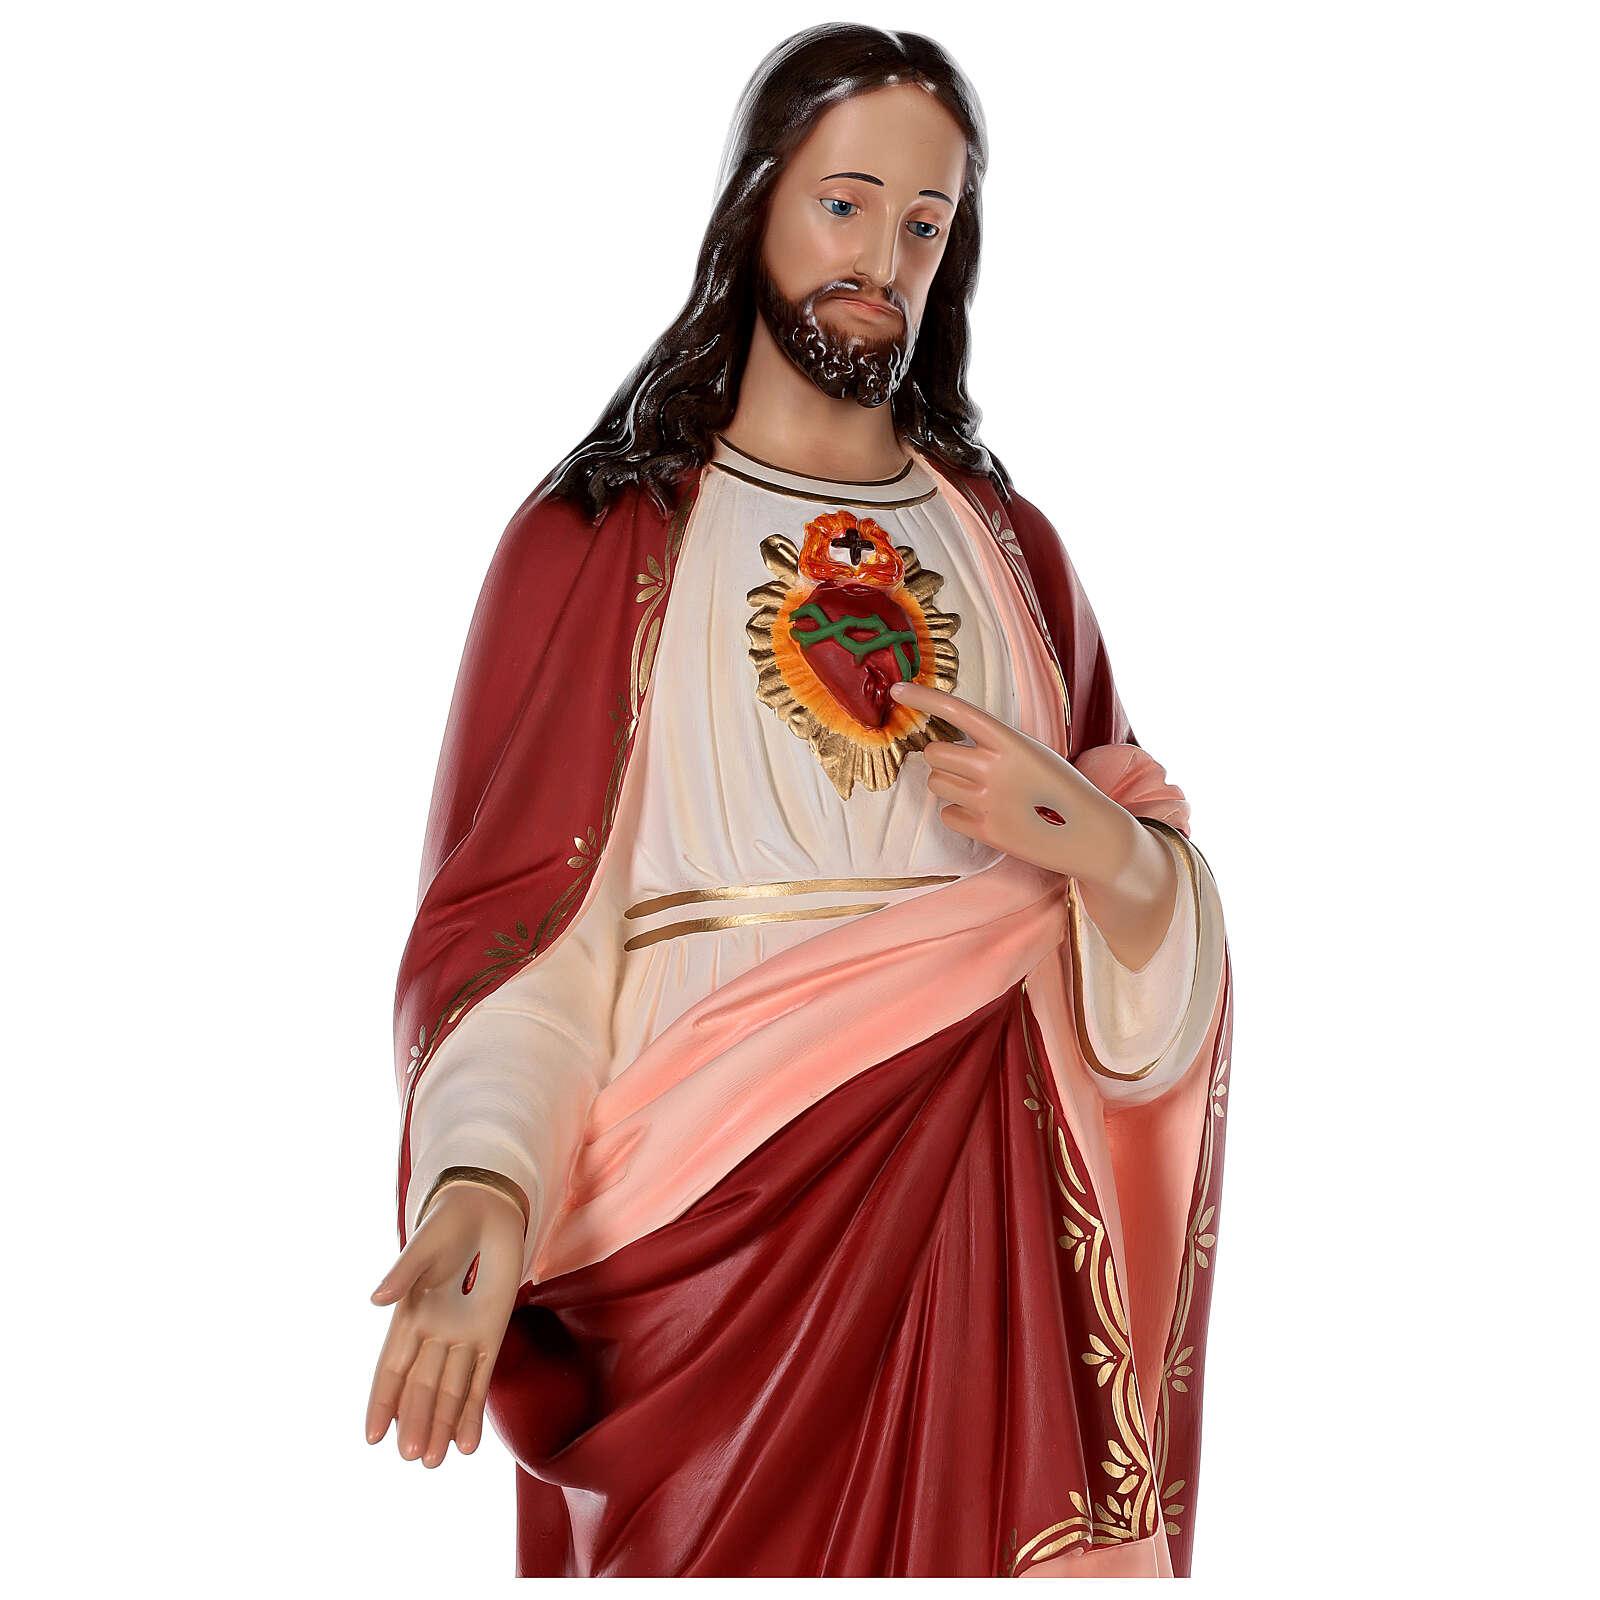 Statua Gesù Sacro Cuore vetroresina colorata 85 cm occhi vetro 4